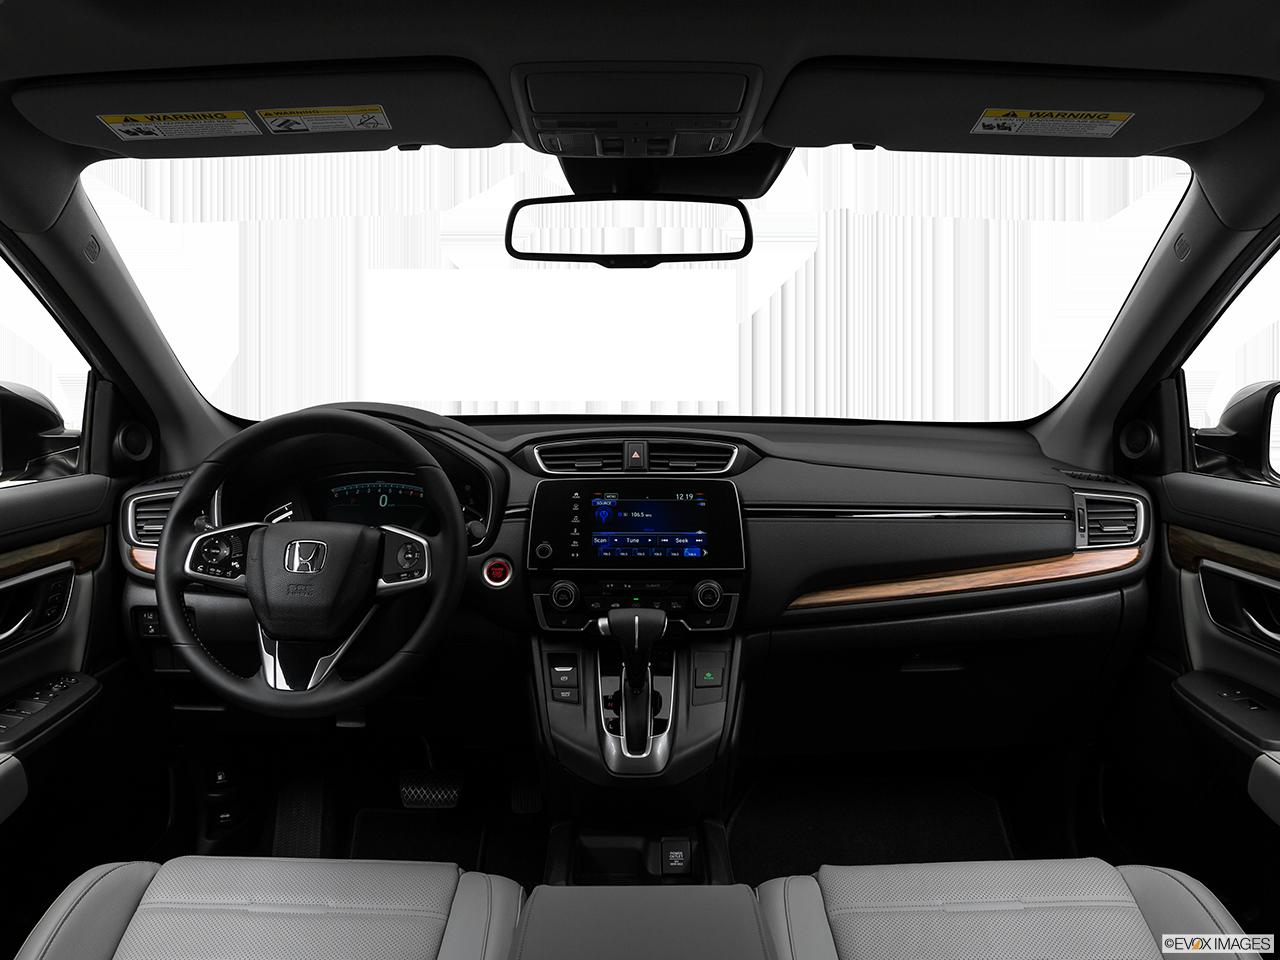 Interior View Of 2017 Honda CR-V serving San Bernardino